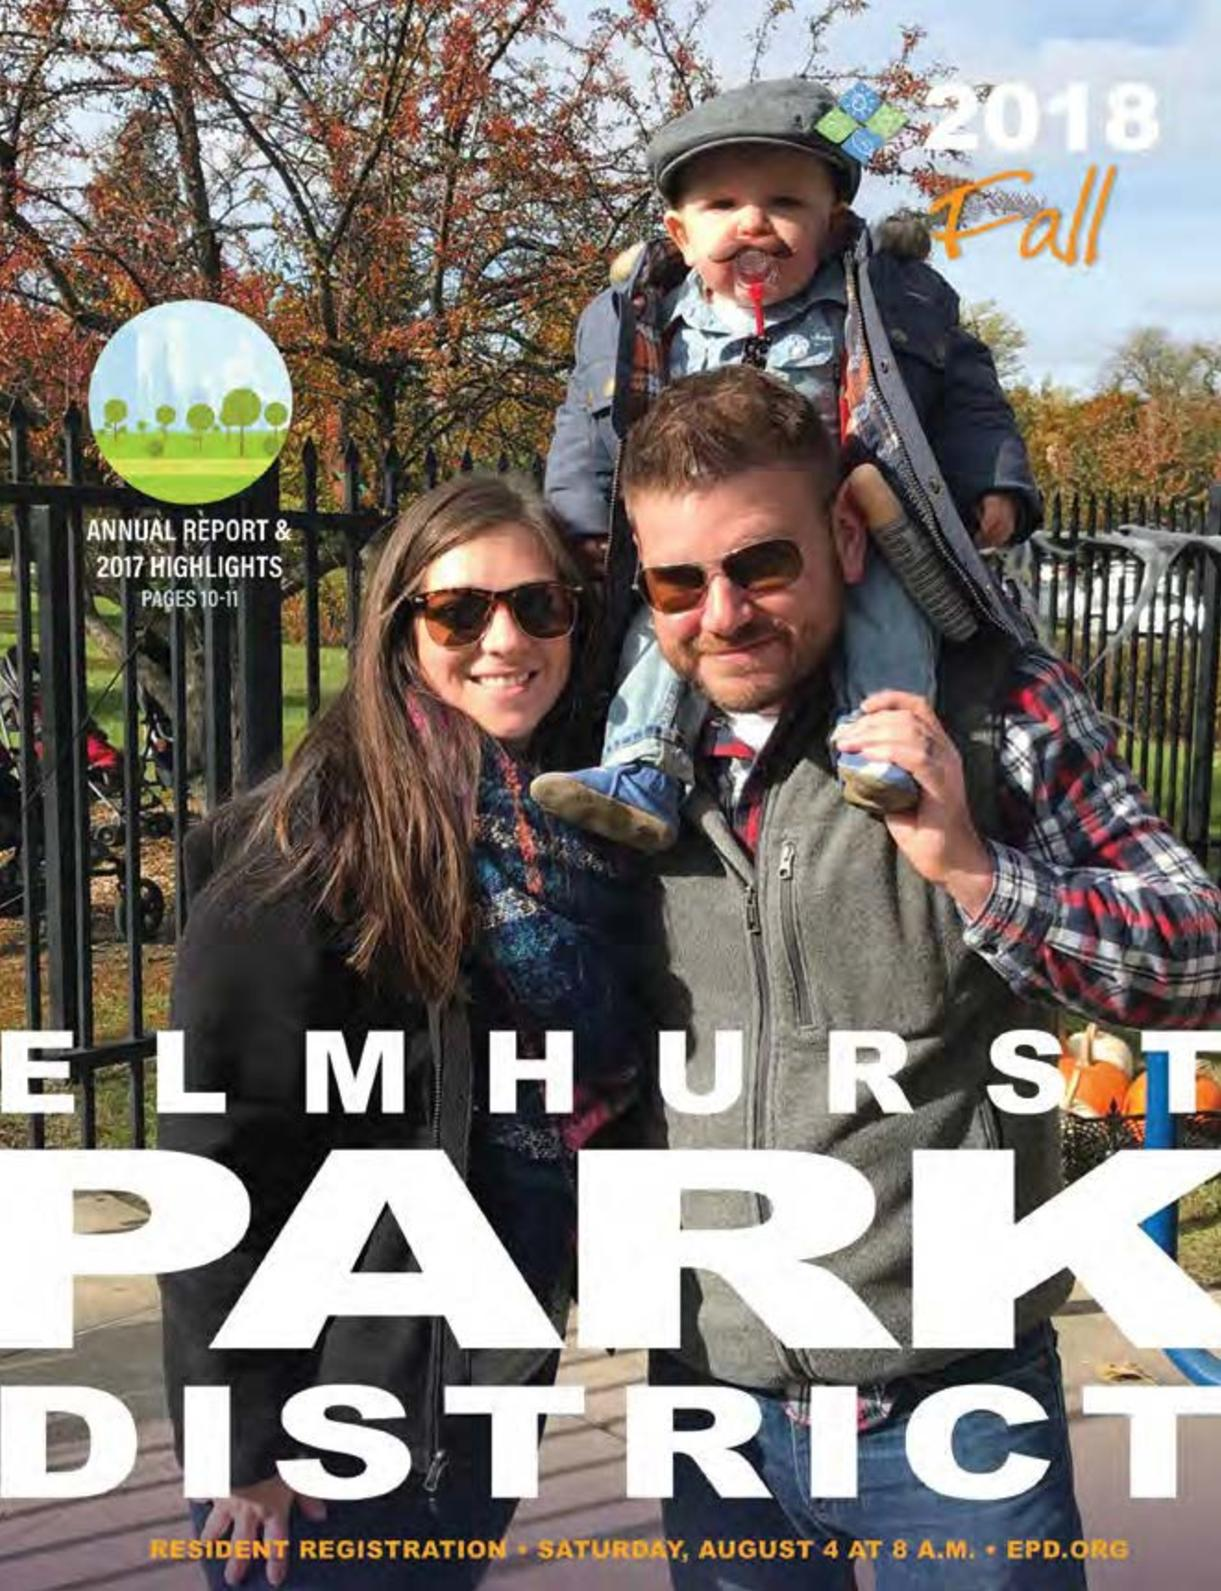 Calaméo - Elmhurst Park District Fall 2018 Brochure